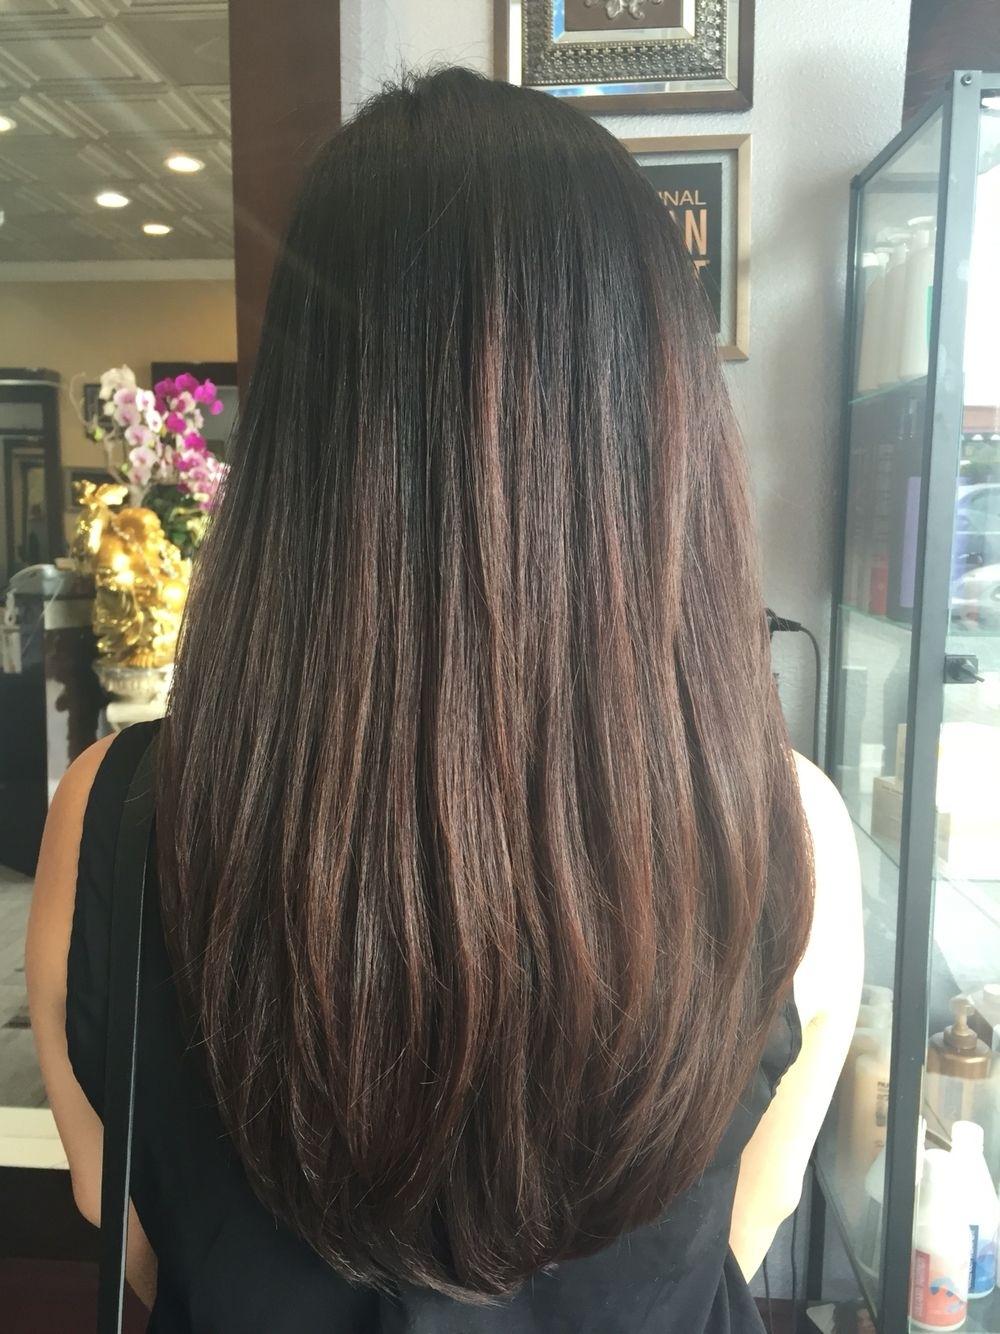 Long Layered Hair With U Shape My Stuff Pinterest | Hair Styles throughout U Shaped Haircut For Thin Hair